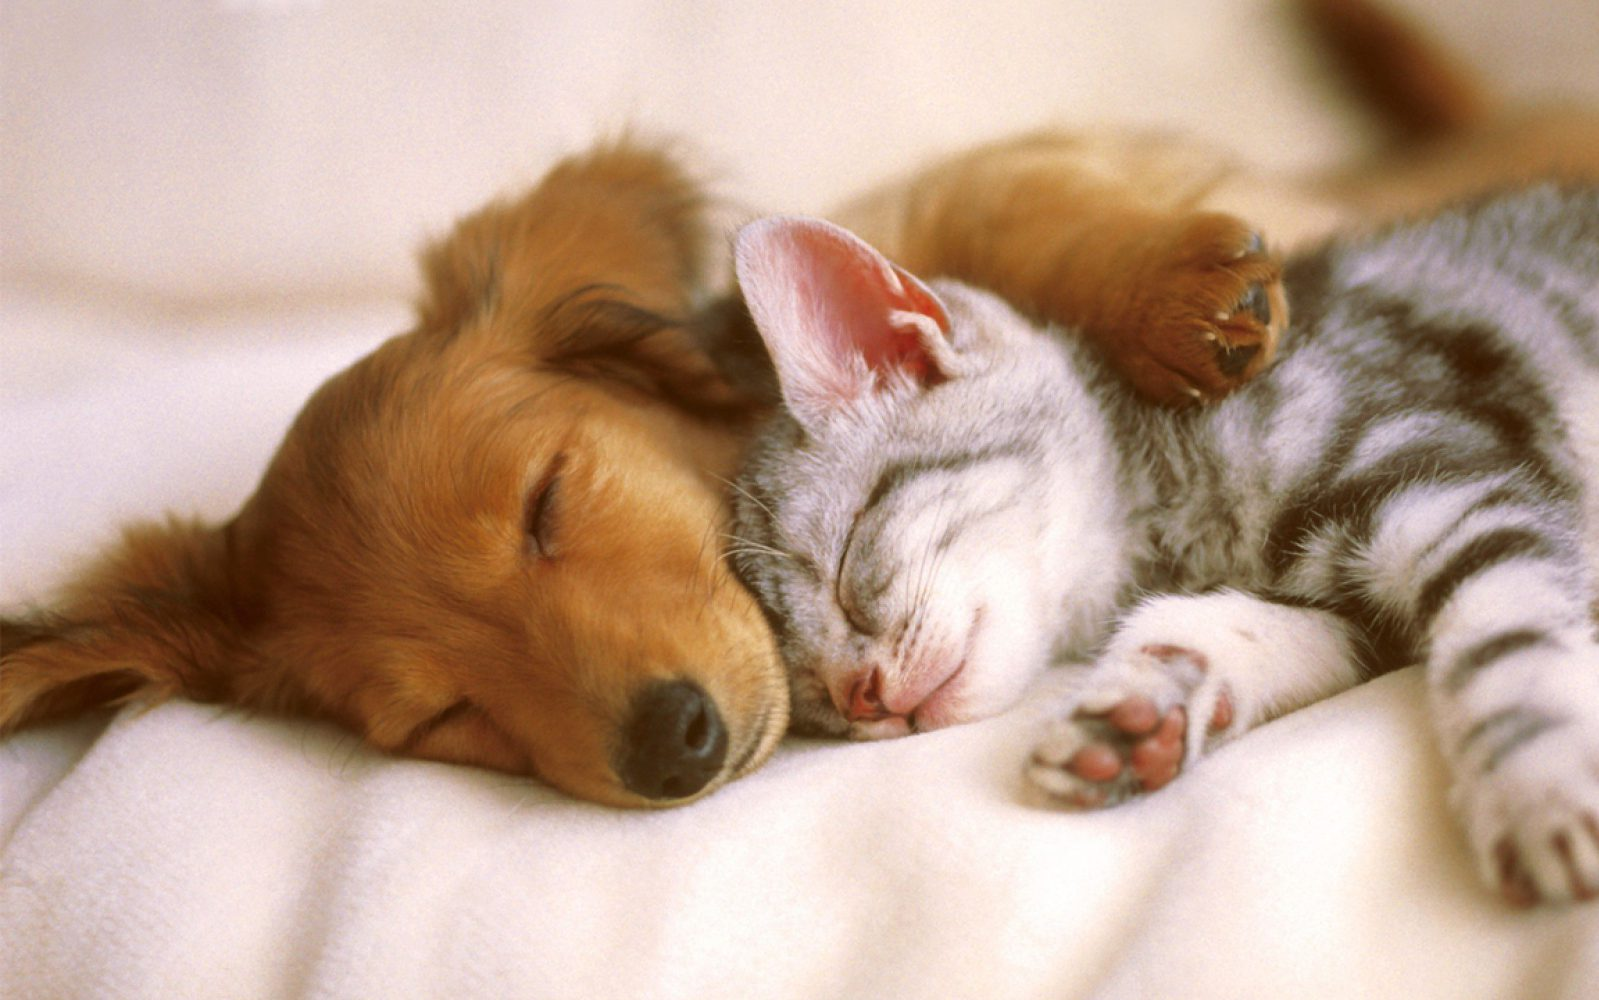 Animali Ereditieri Quali I Più Famosi Alberto Onofri Chiari Blog